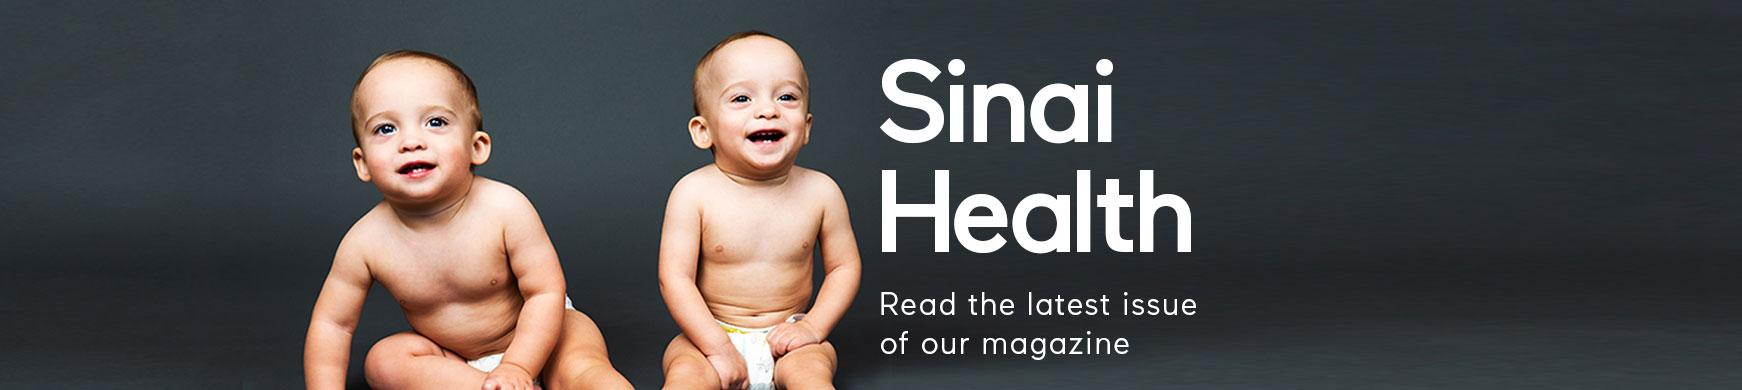 Home - Bridgepoint Health